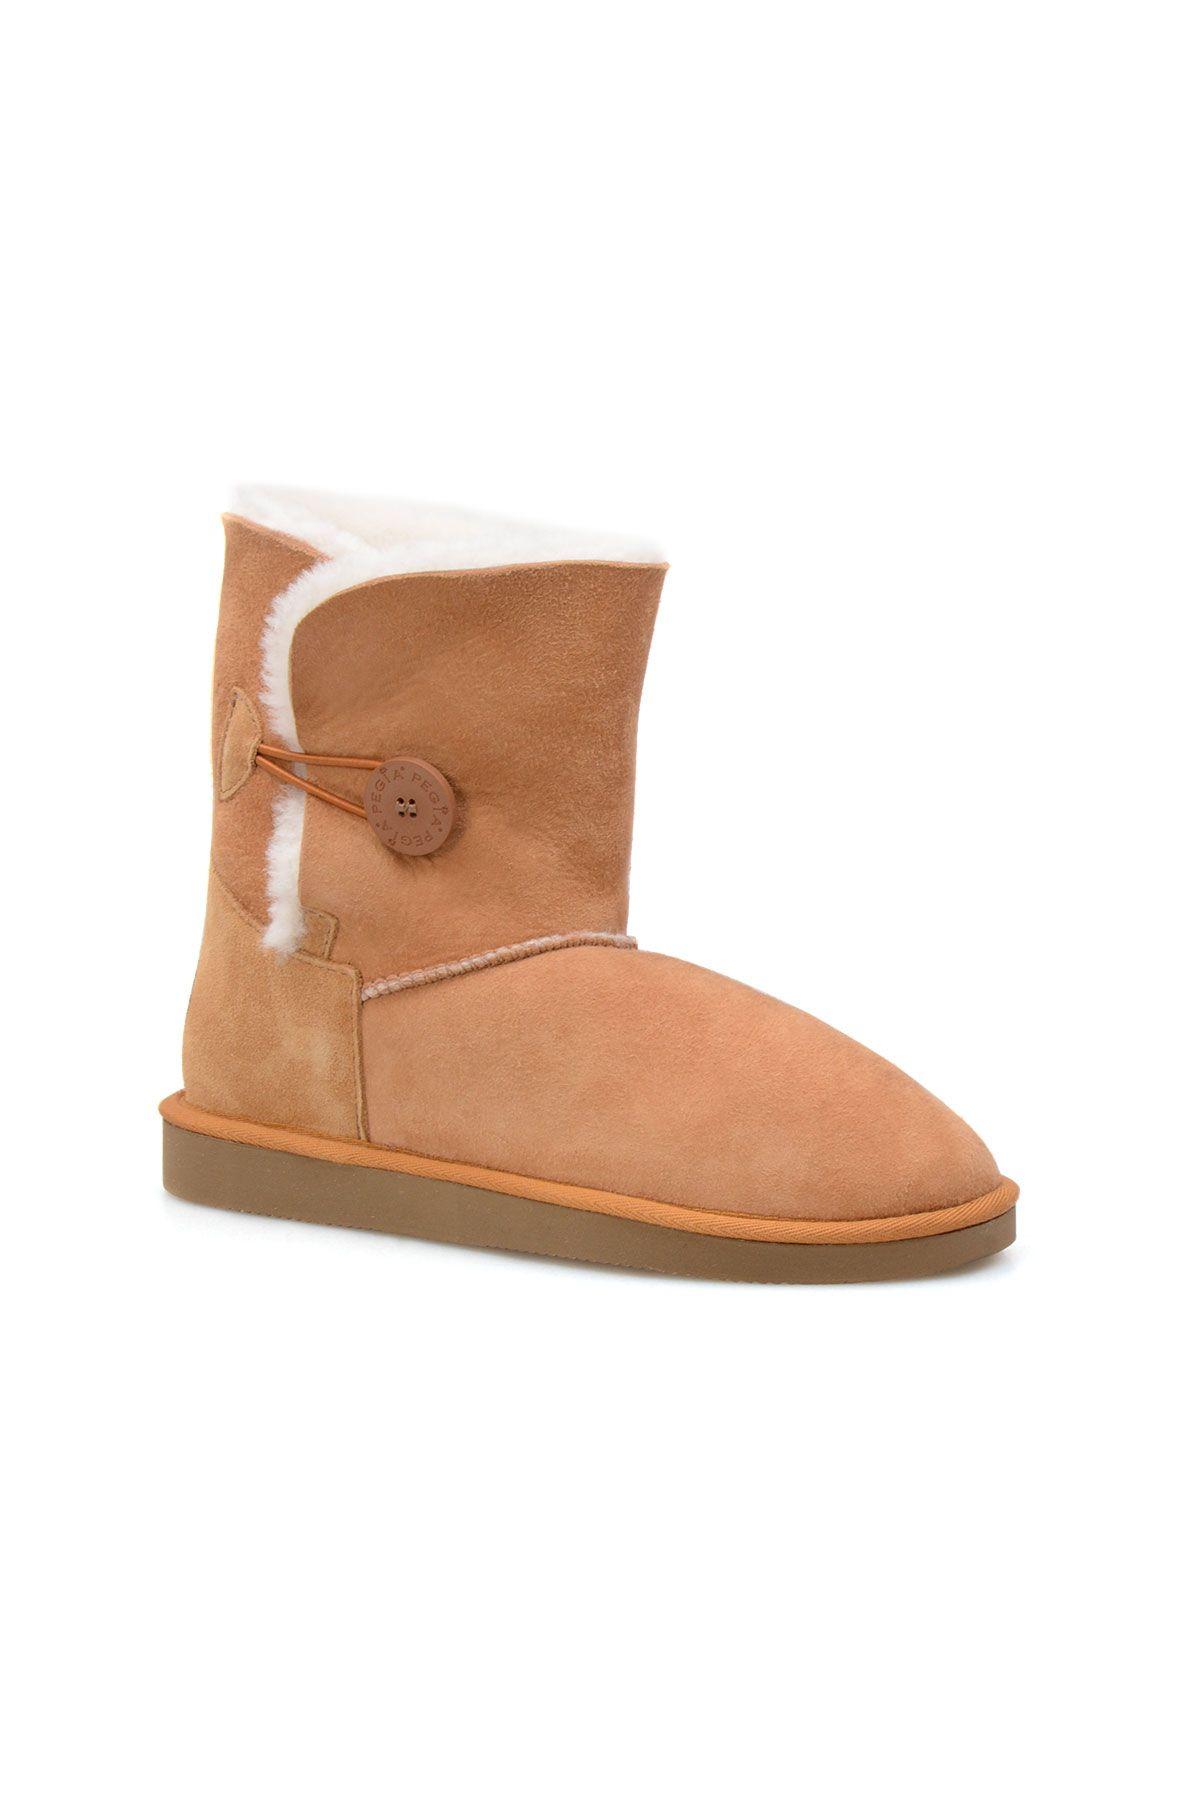 Pegia Genuine Sheepskin Suede Women's Boots with Botton 191031 Ginger